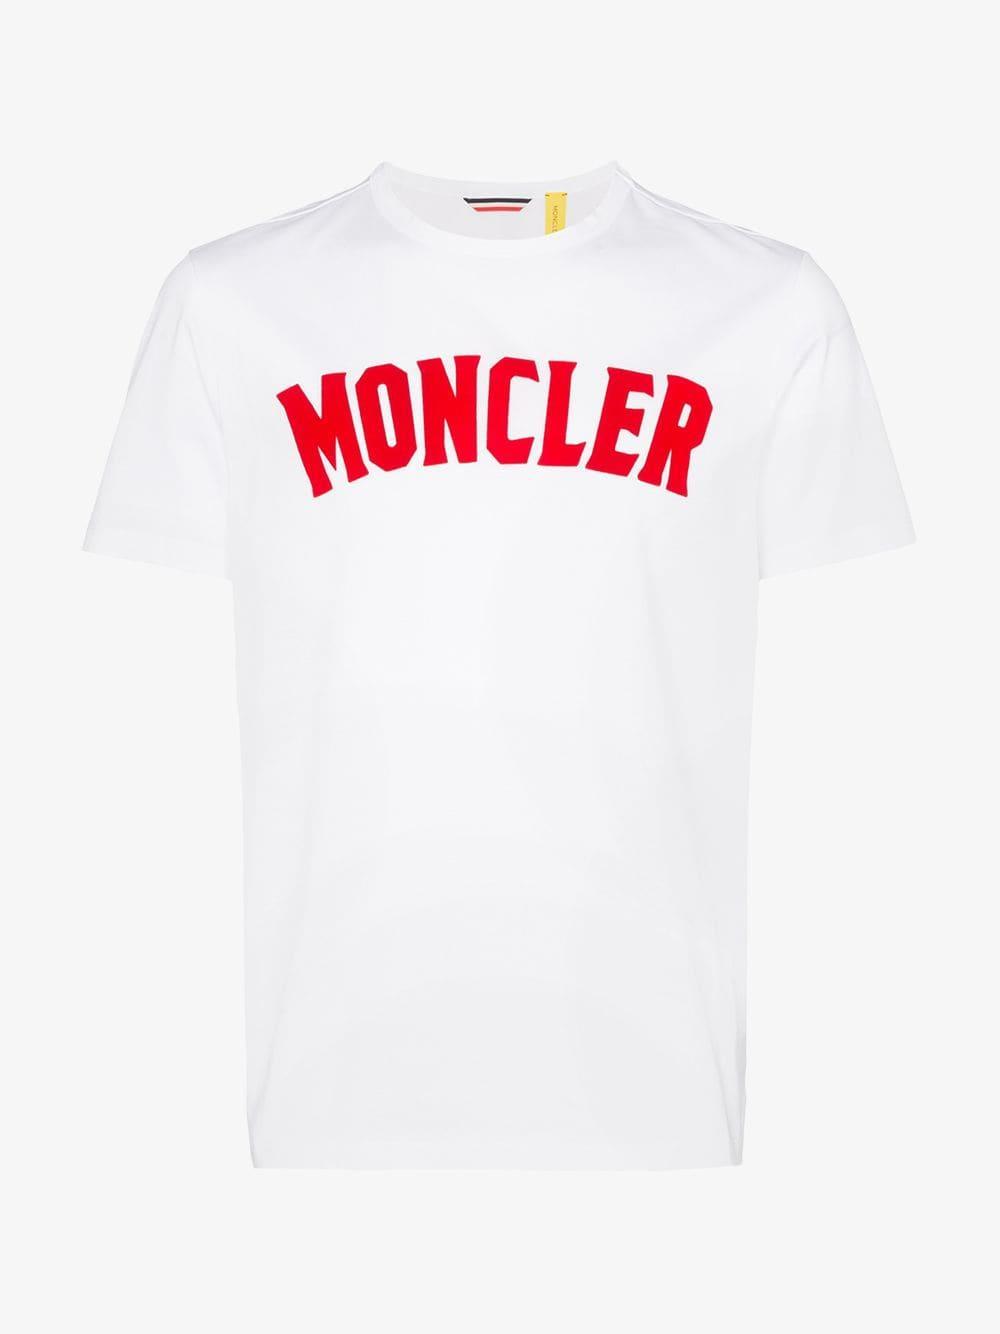 ad92e42b4 Moncler Genius 2 Moncler 1952 Logo Cotton T-shirt in White for Men ...